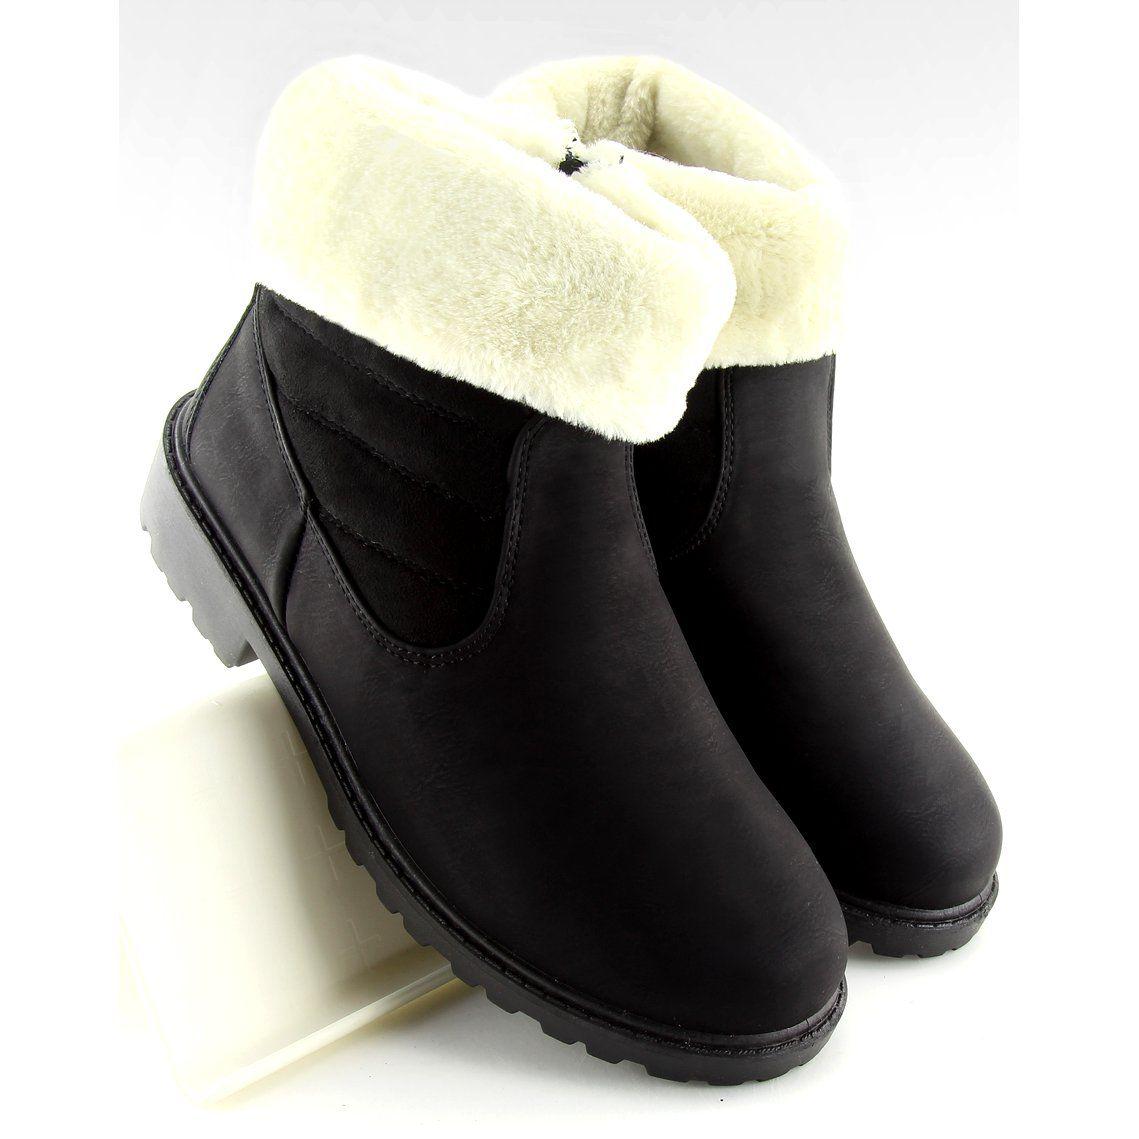 Botki Grubo Ocieplane Czarne Zy9210 Black Boots Womens Boots Black Boots